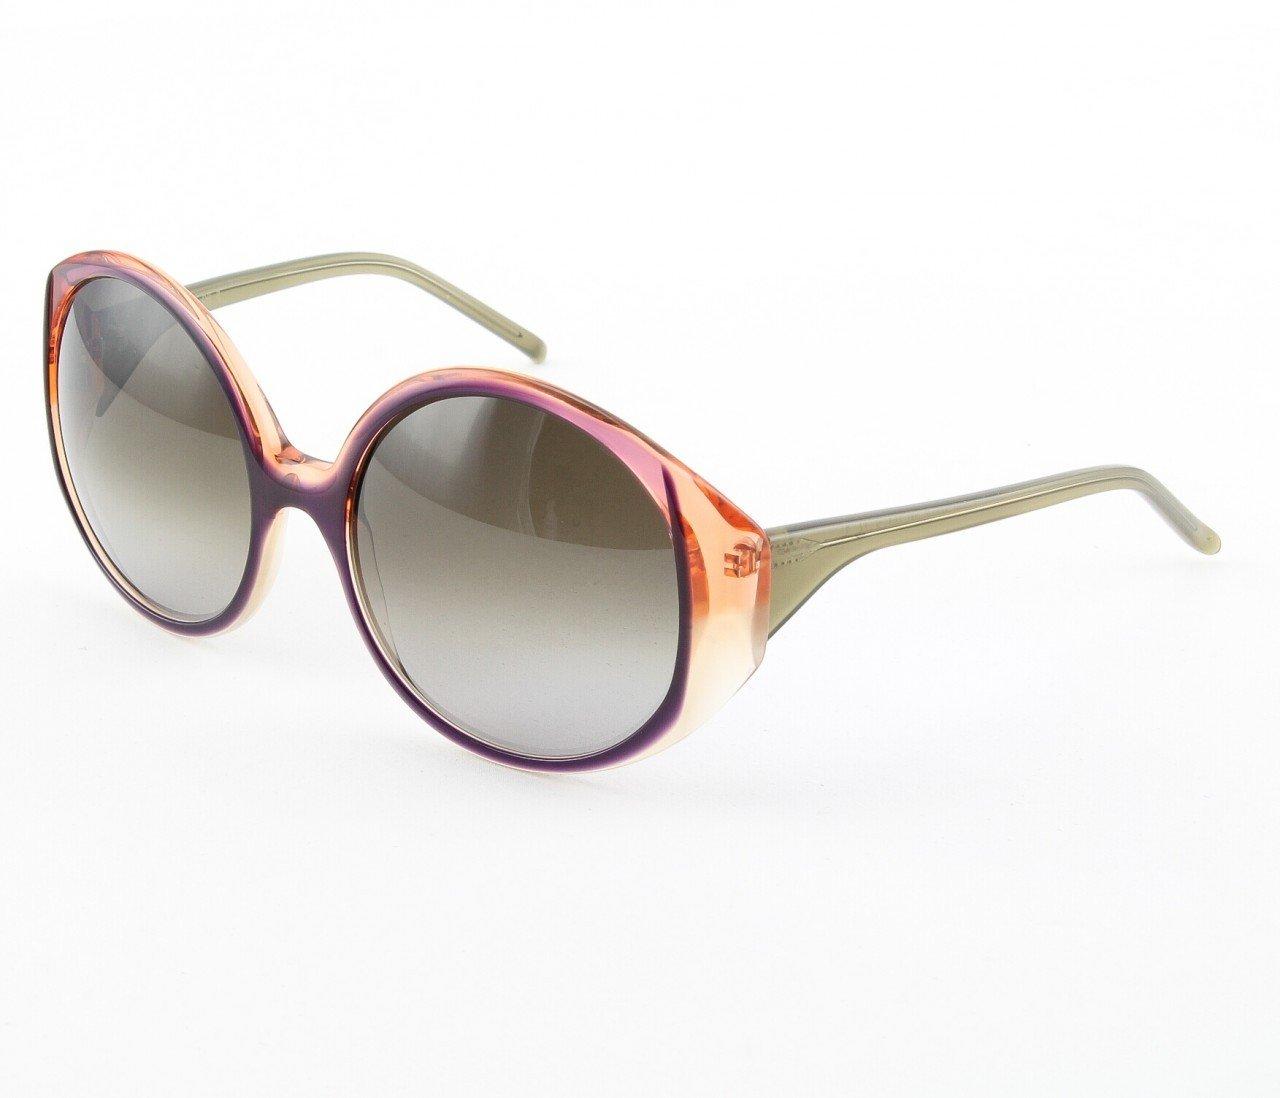 Marni MA217 Sunglasses 06 Purple Frame w/ Crystal Orange and Cream Accents